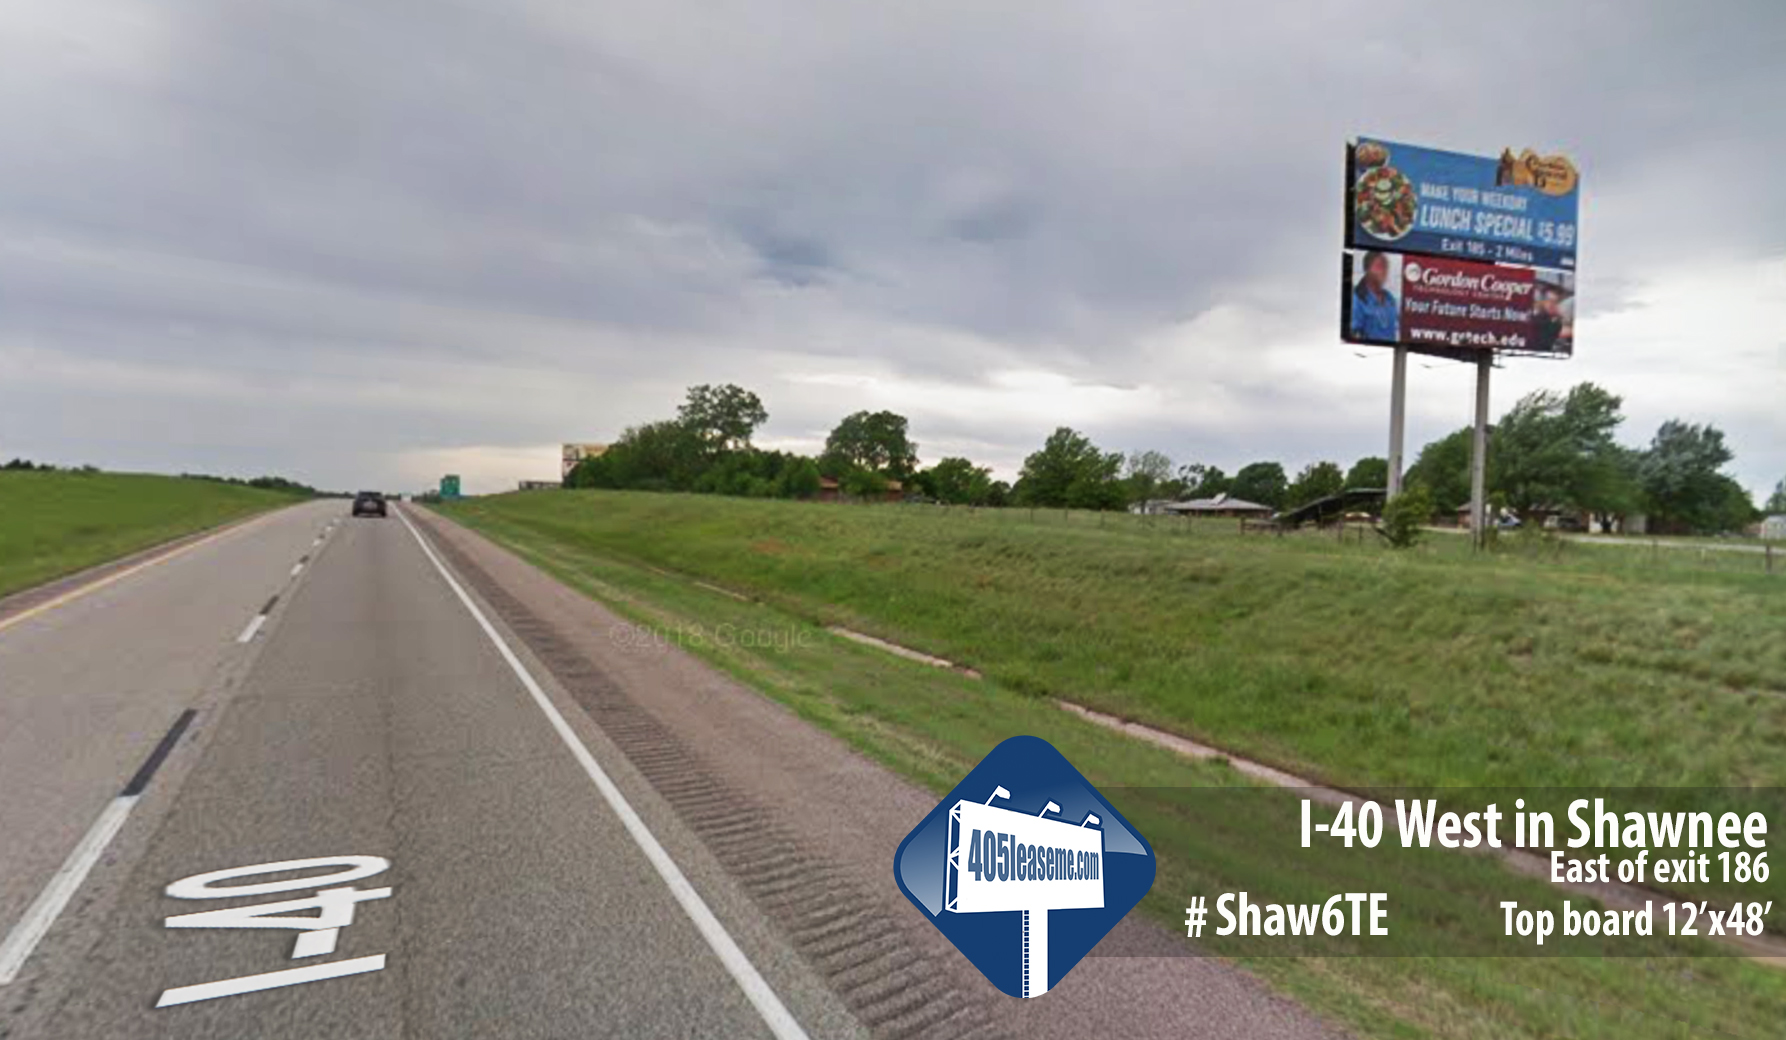 10 Shawnee - Shaw6TE